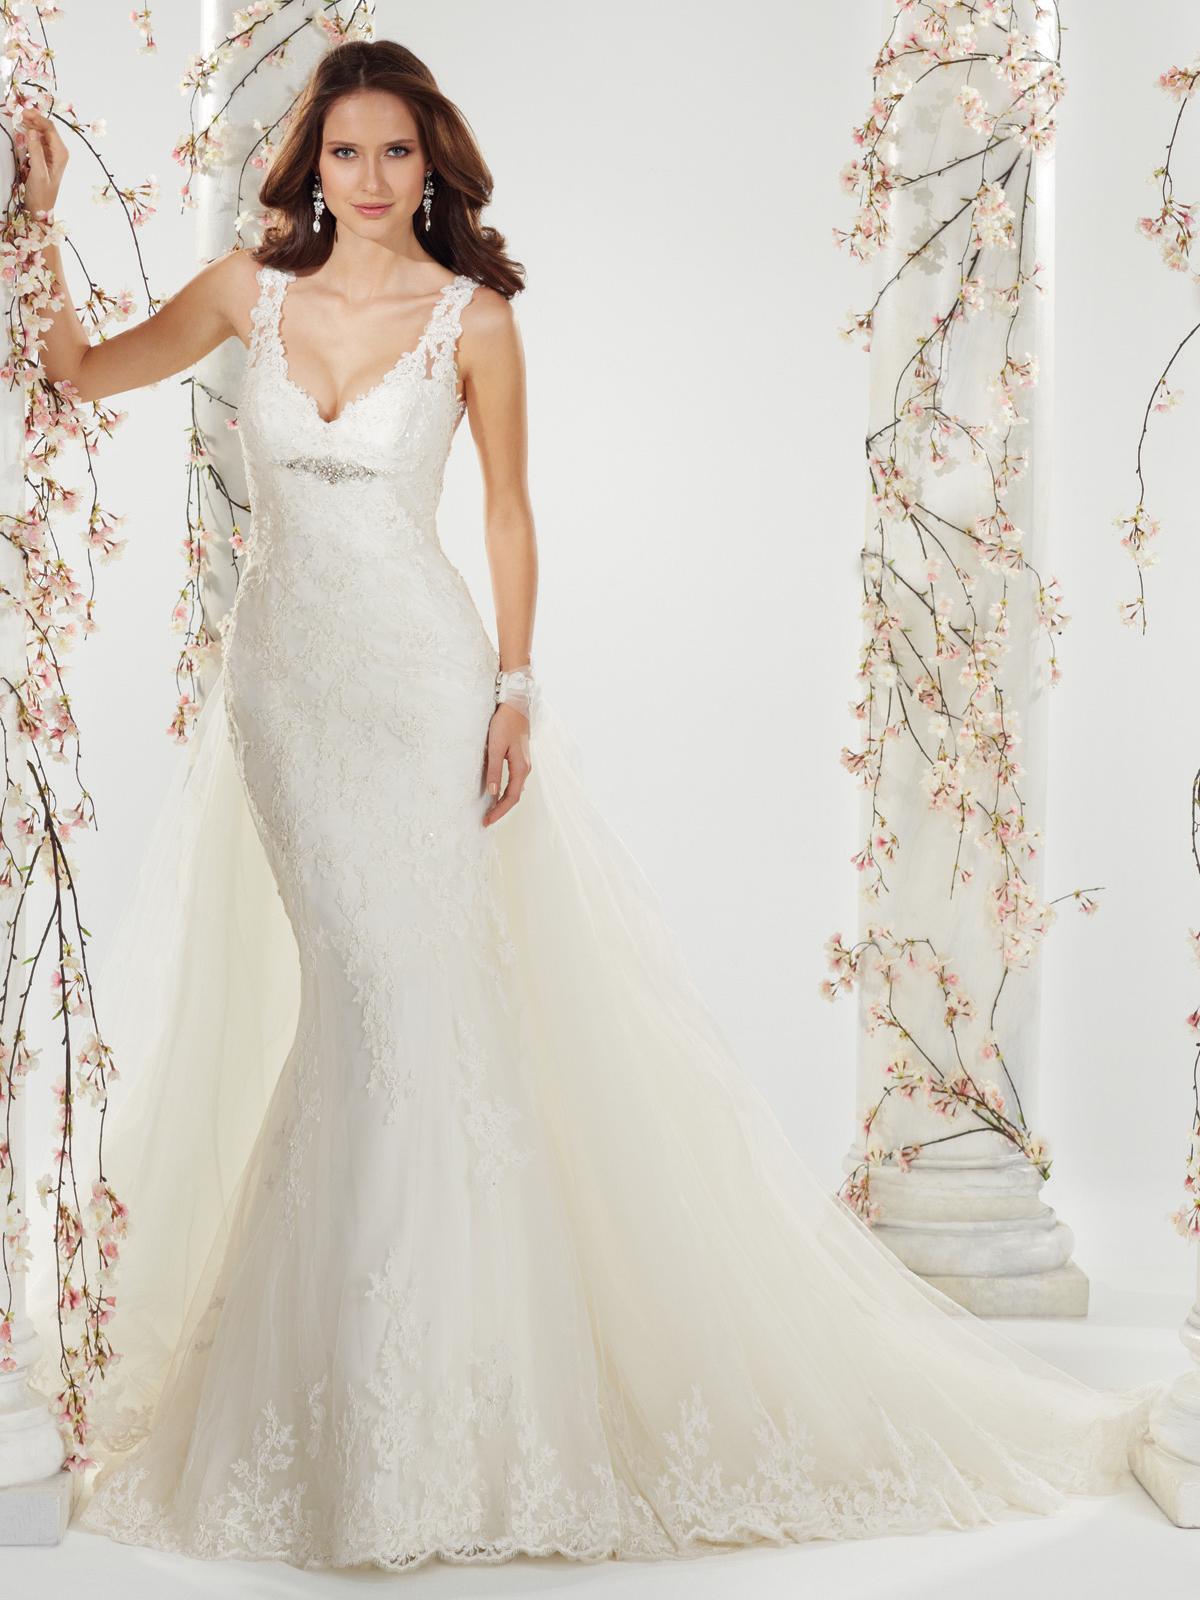 ANN MATTHEWS BRIDAL ALBUQUERQUE WEDDING DRESSES